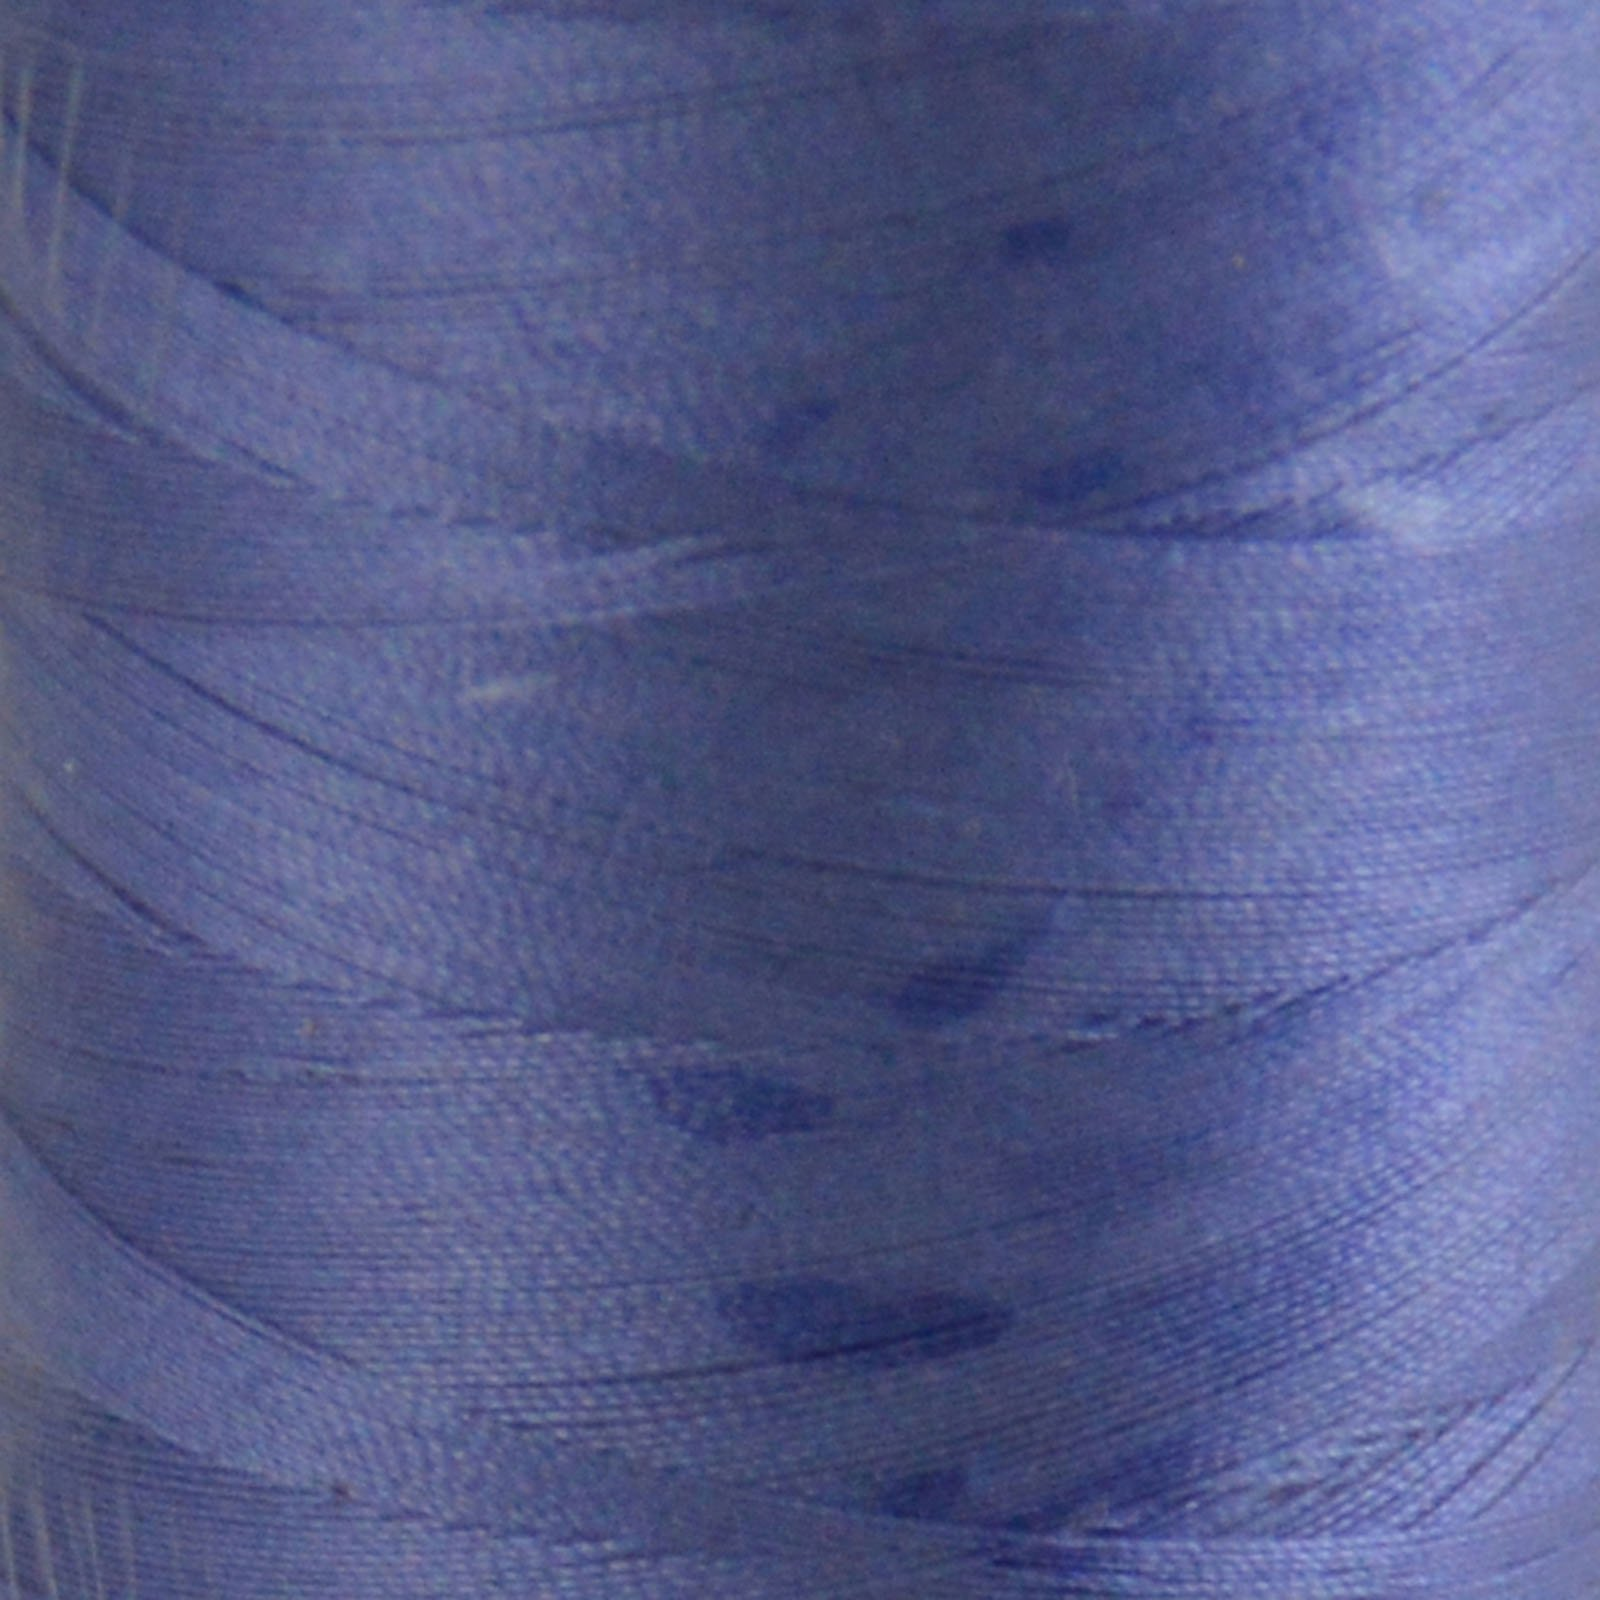 # 2525 Dusty Blue Violet